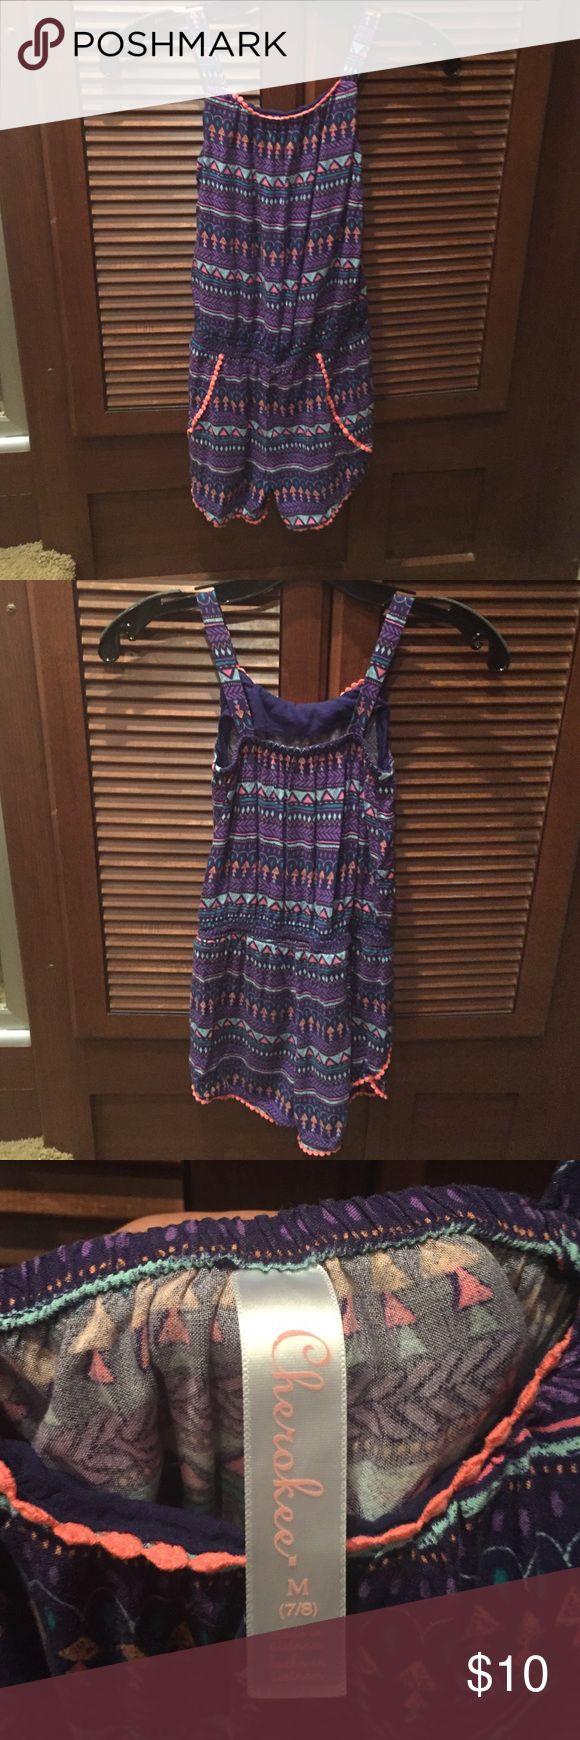 Cherokee girls jumper size 7/8 Cute Cherokee brand girls jumper size 7/8 Cherokee Dresses